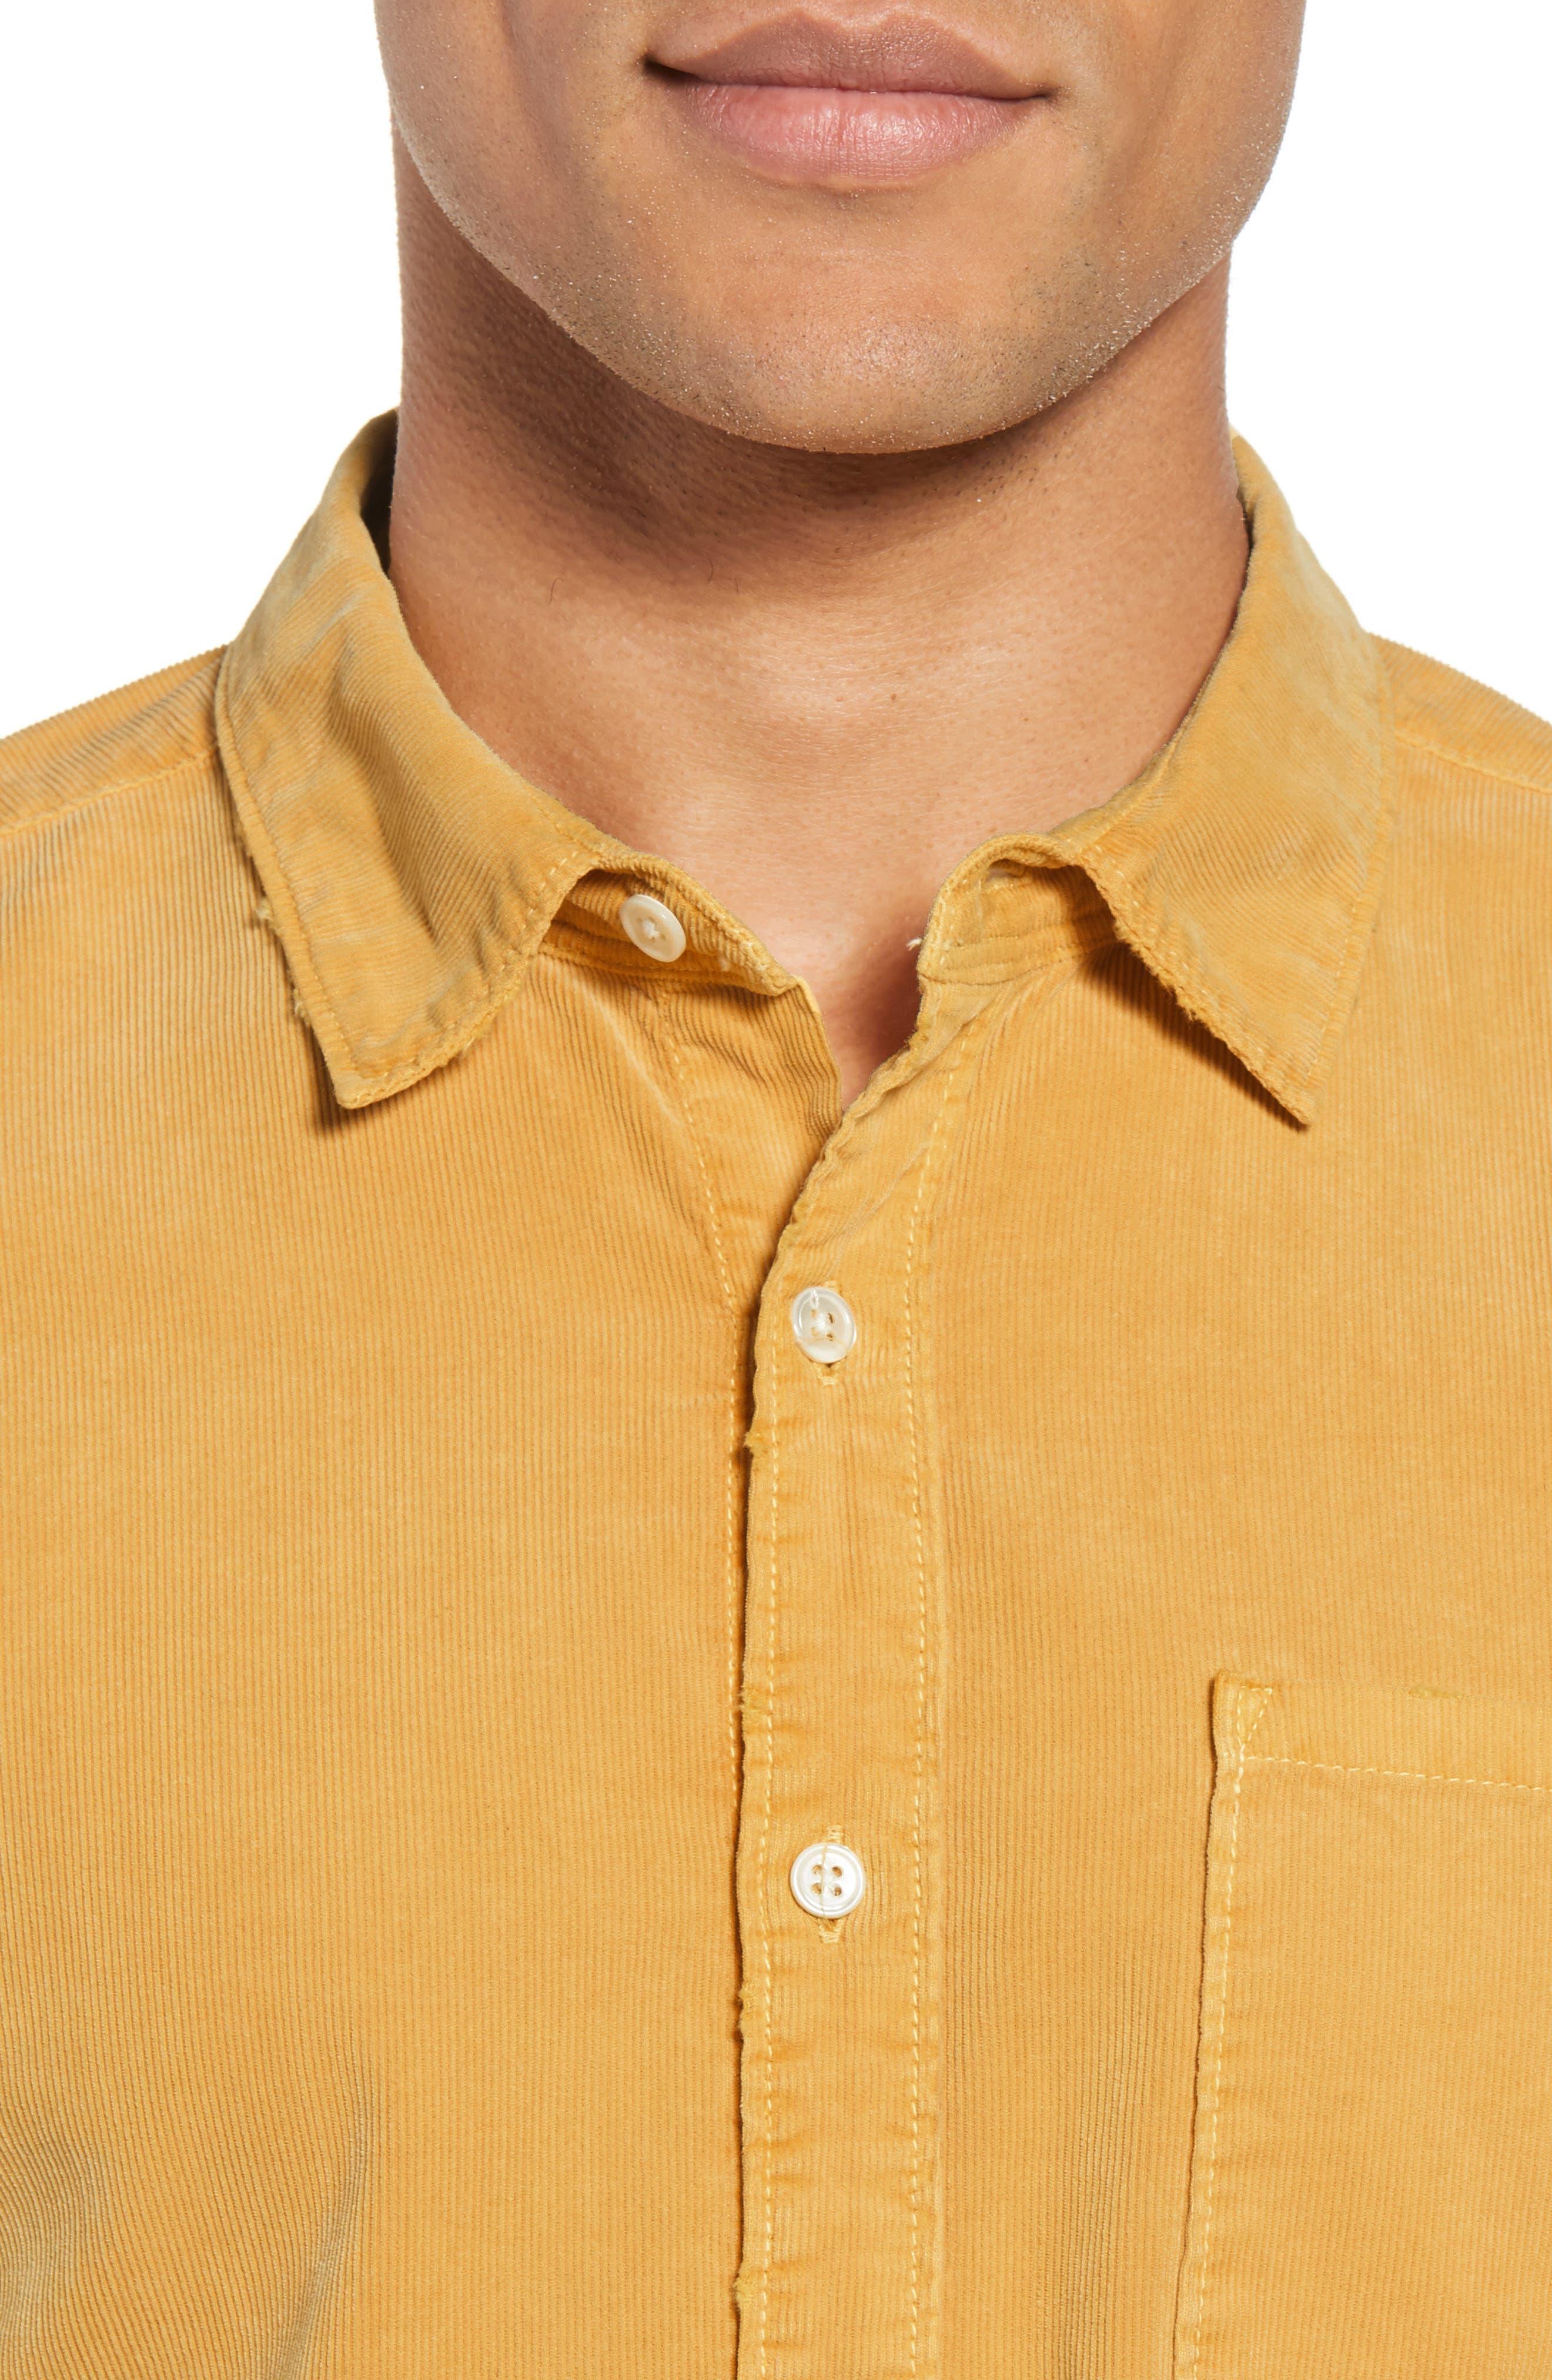 Slim Fit Corduroy Shirt,                             Alternate thumbnail 2, color,                             FADED GOLDEN GLOW